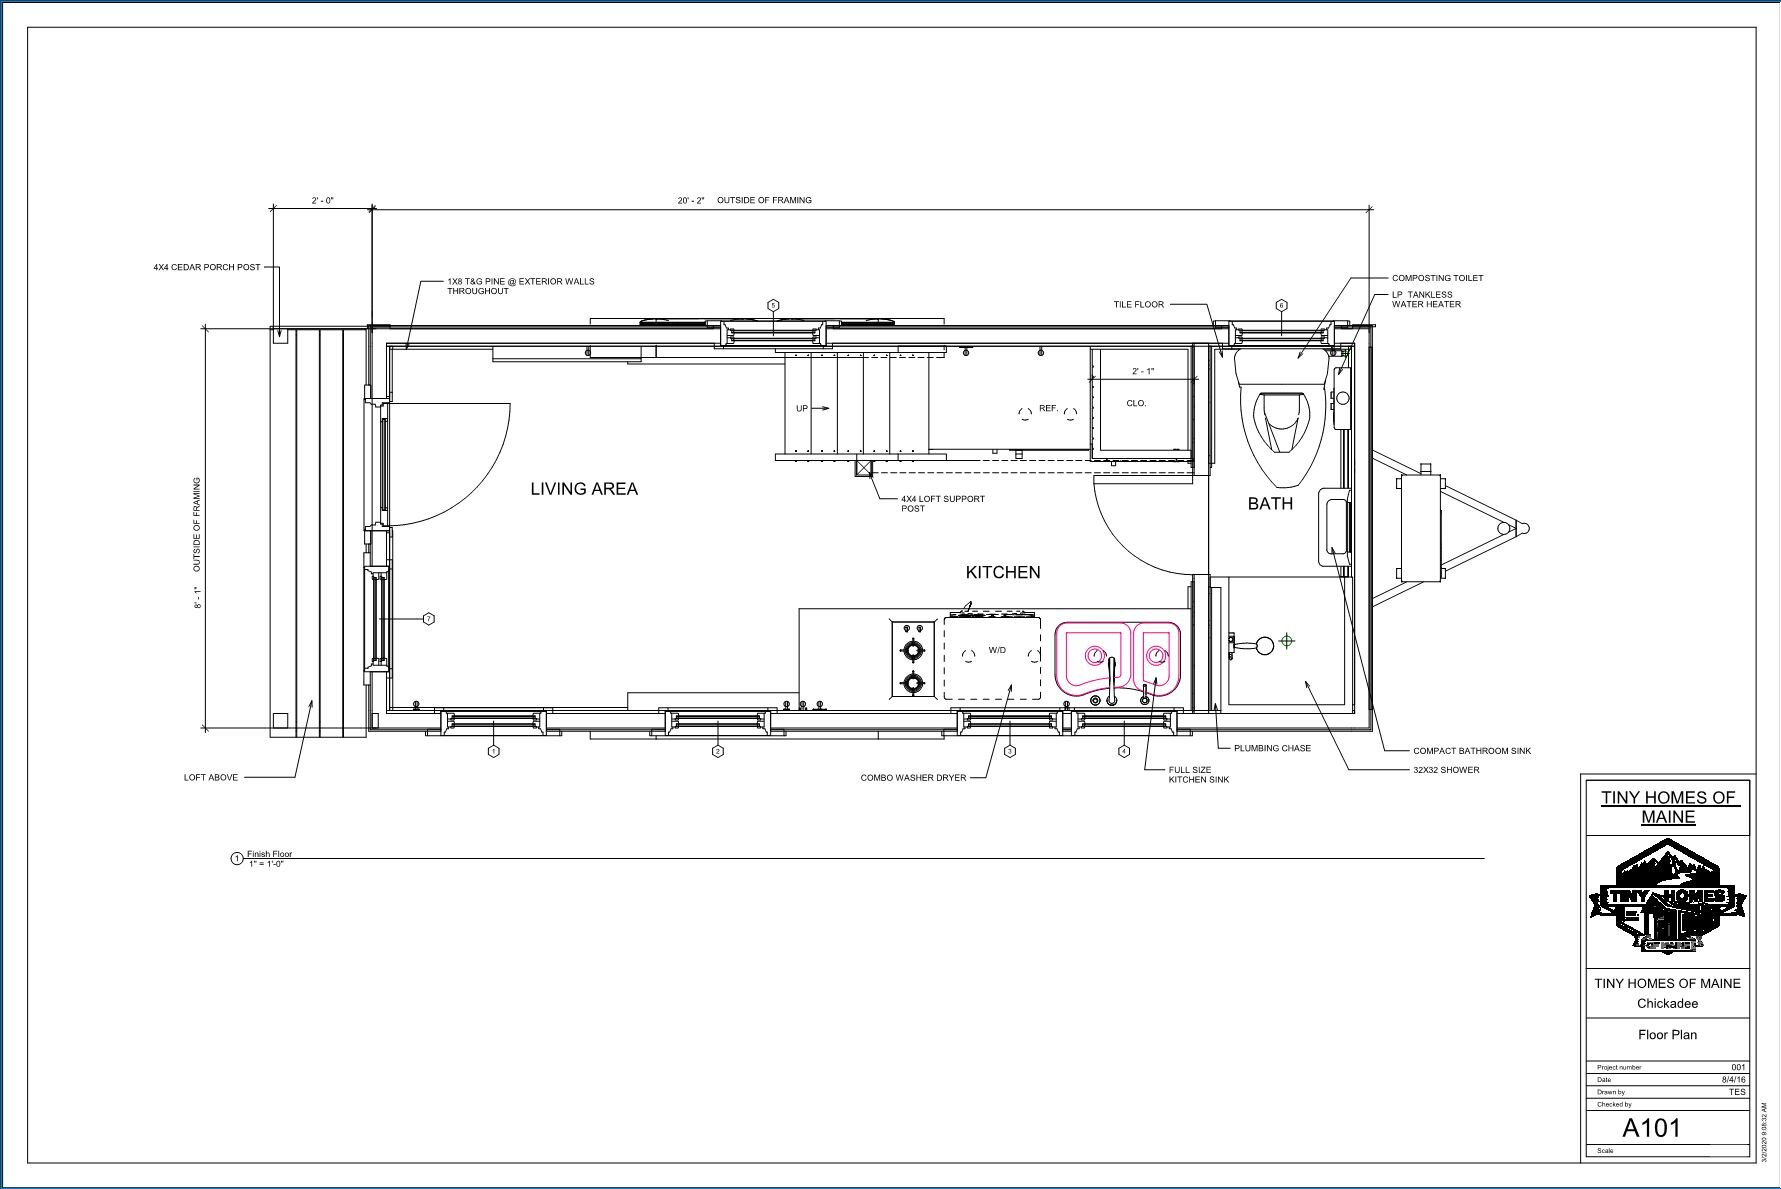 Tiny Home Floor Plans Tiny Homes Of Maine